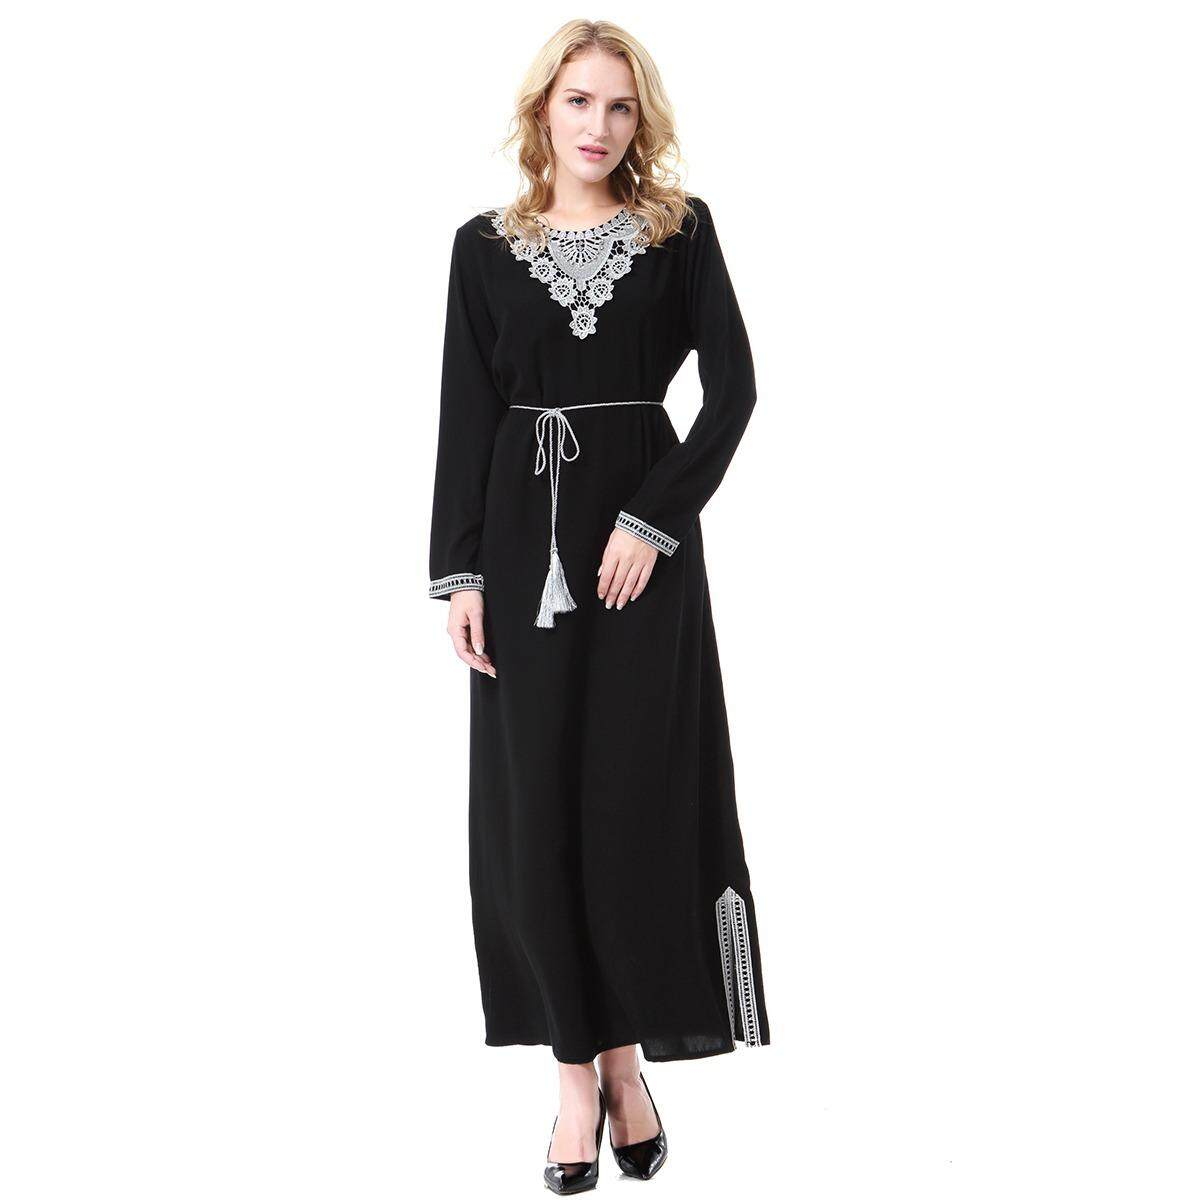 Kualitas Tinggi Busana Wanita Muslim Perak Pola Polyester Abaya Kaftan Lengan Panjang Islam Indonesia Gaun Panjang Jubah